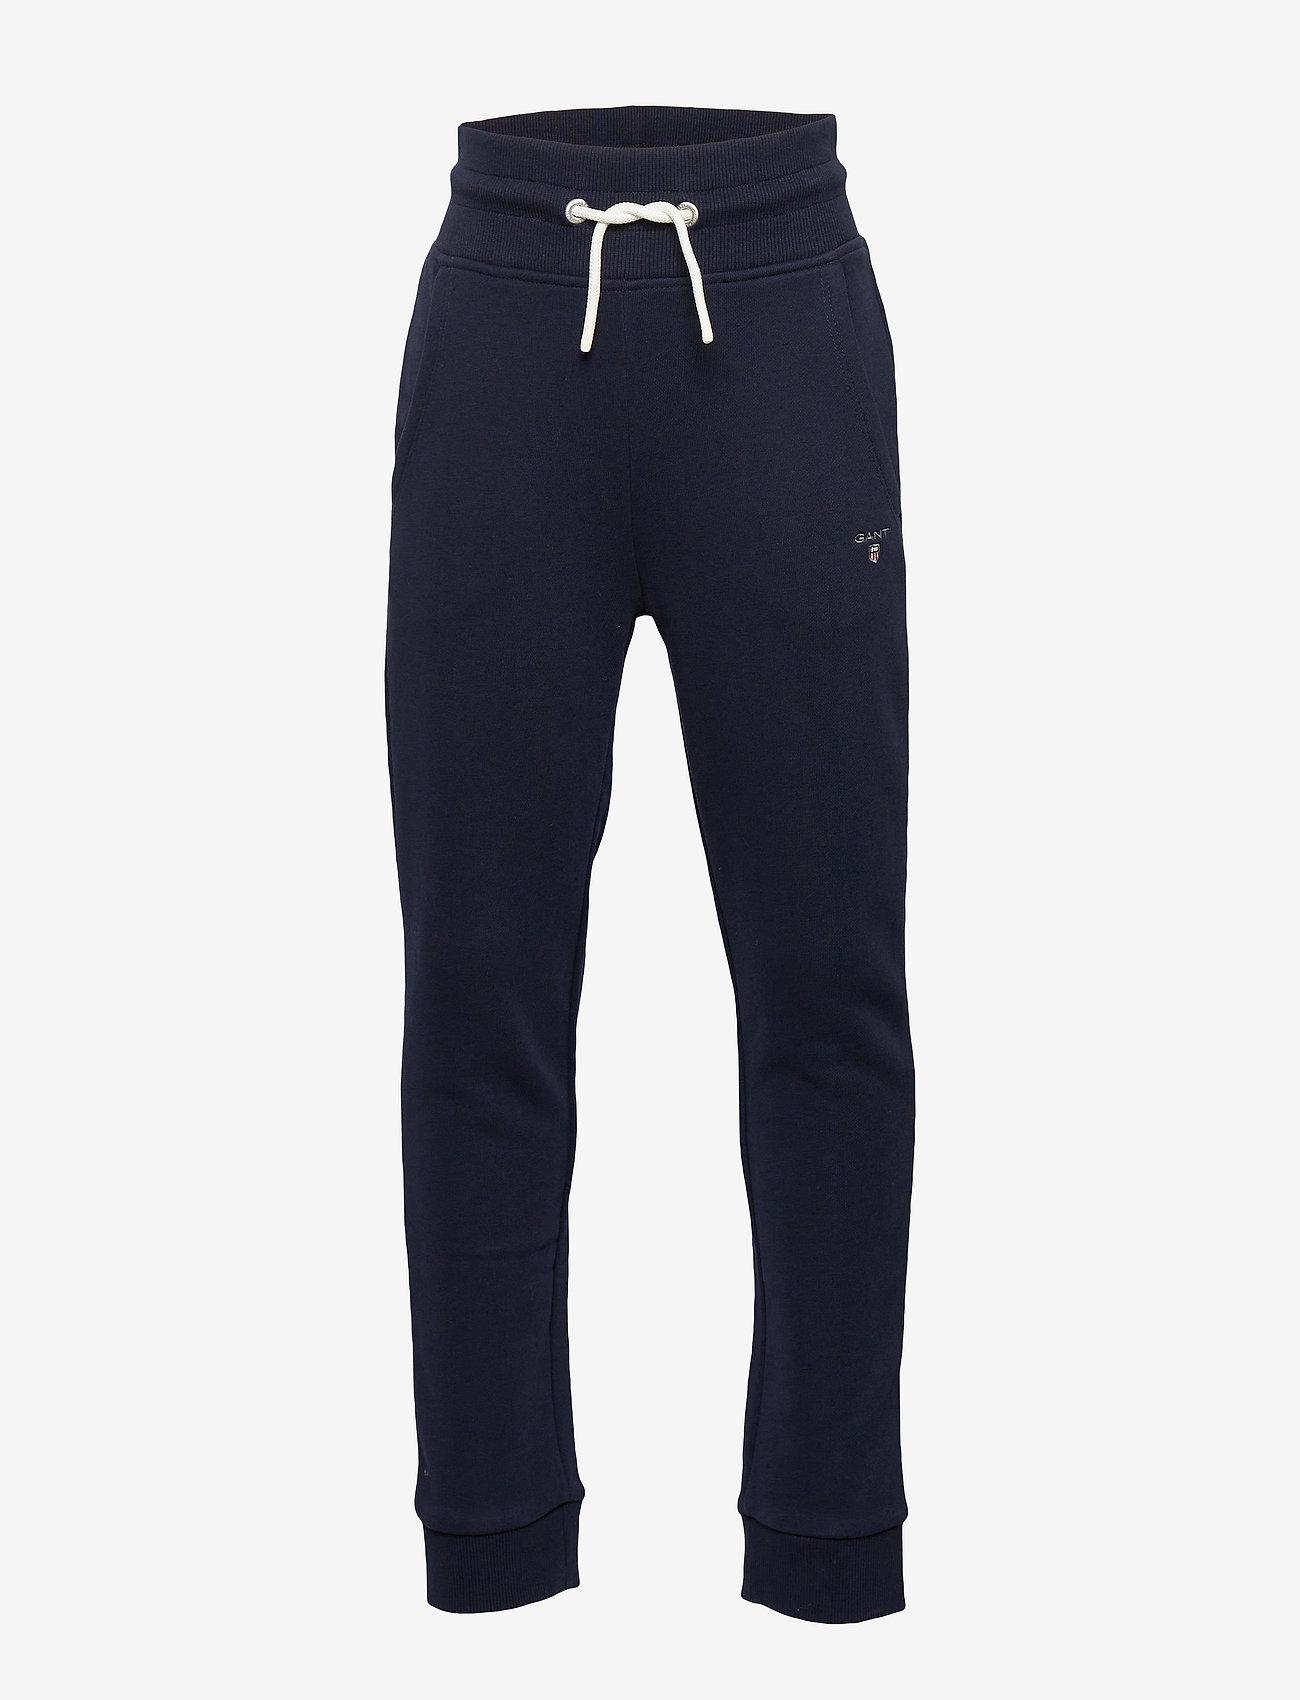 GANT - THE ORIGINAL SWEAT PANTS - sweatpants - evening blue - 0